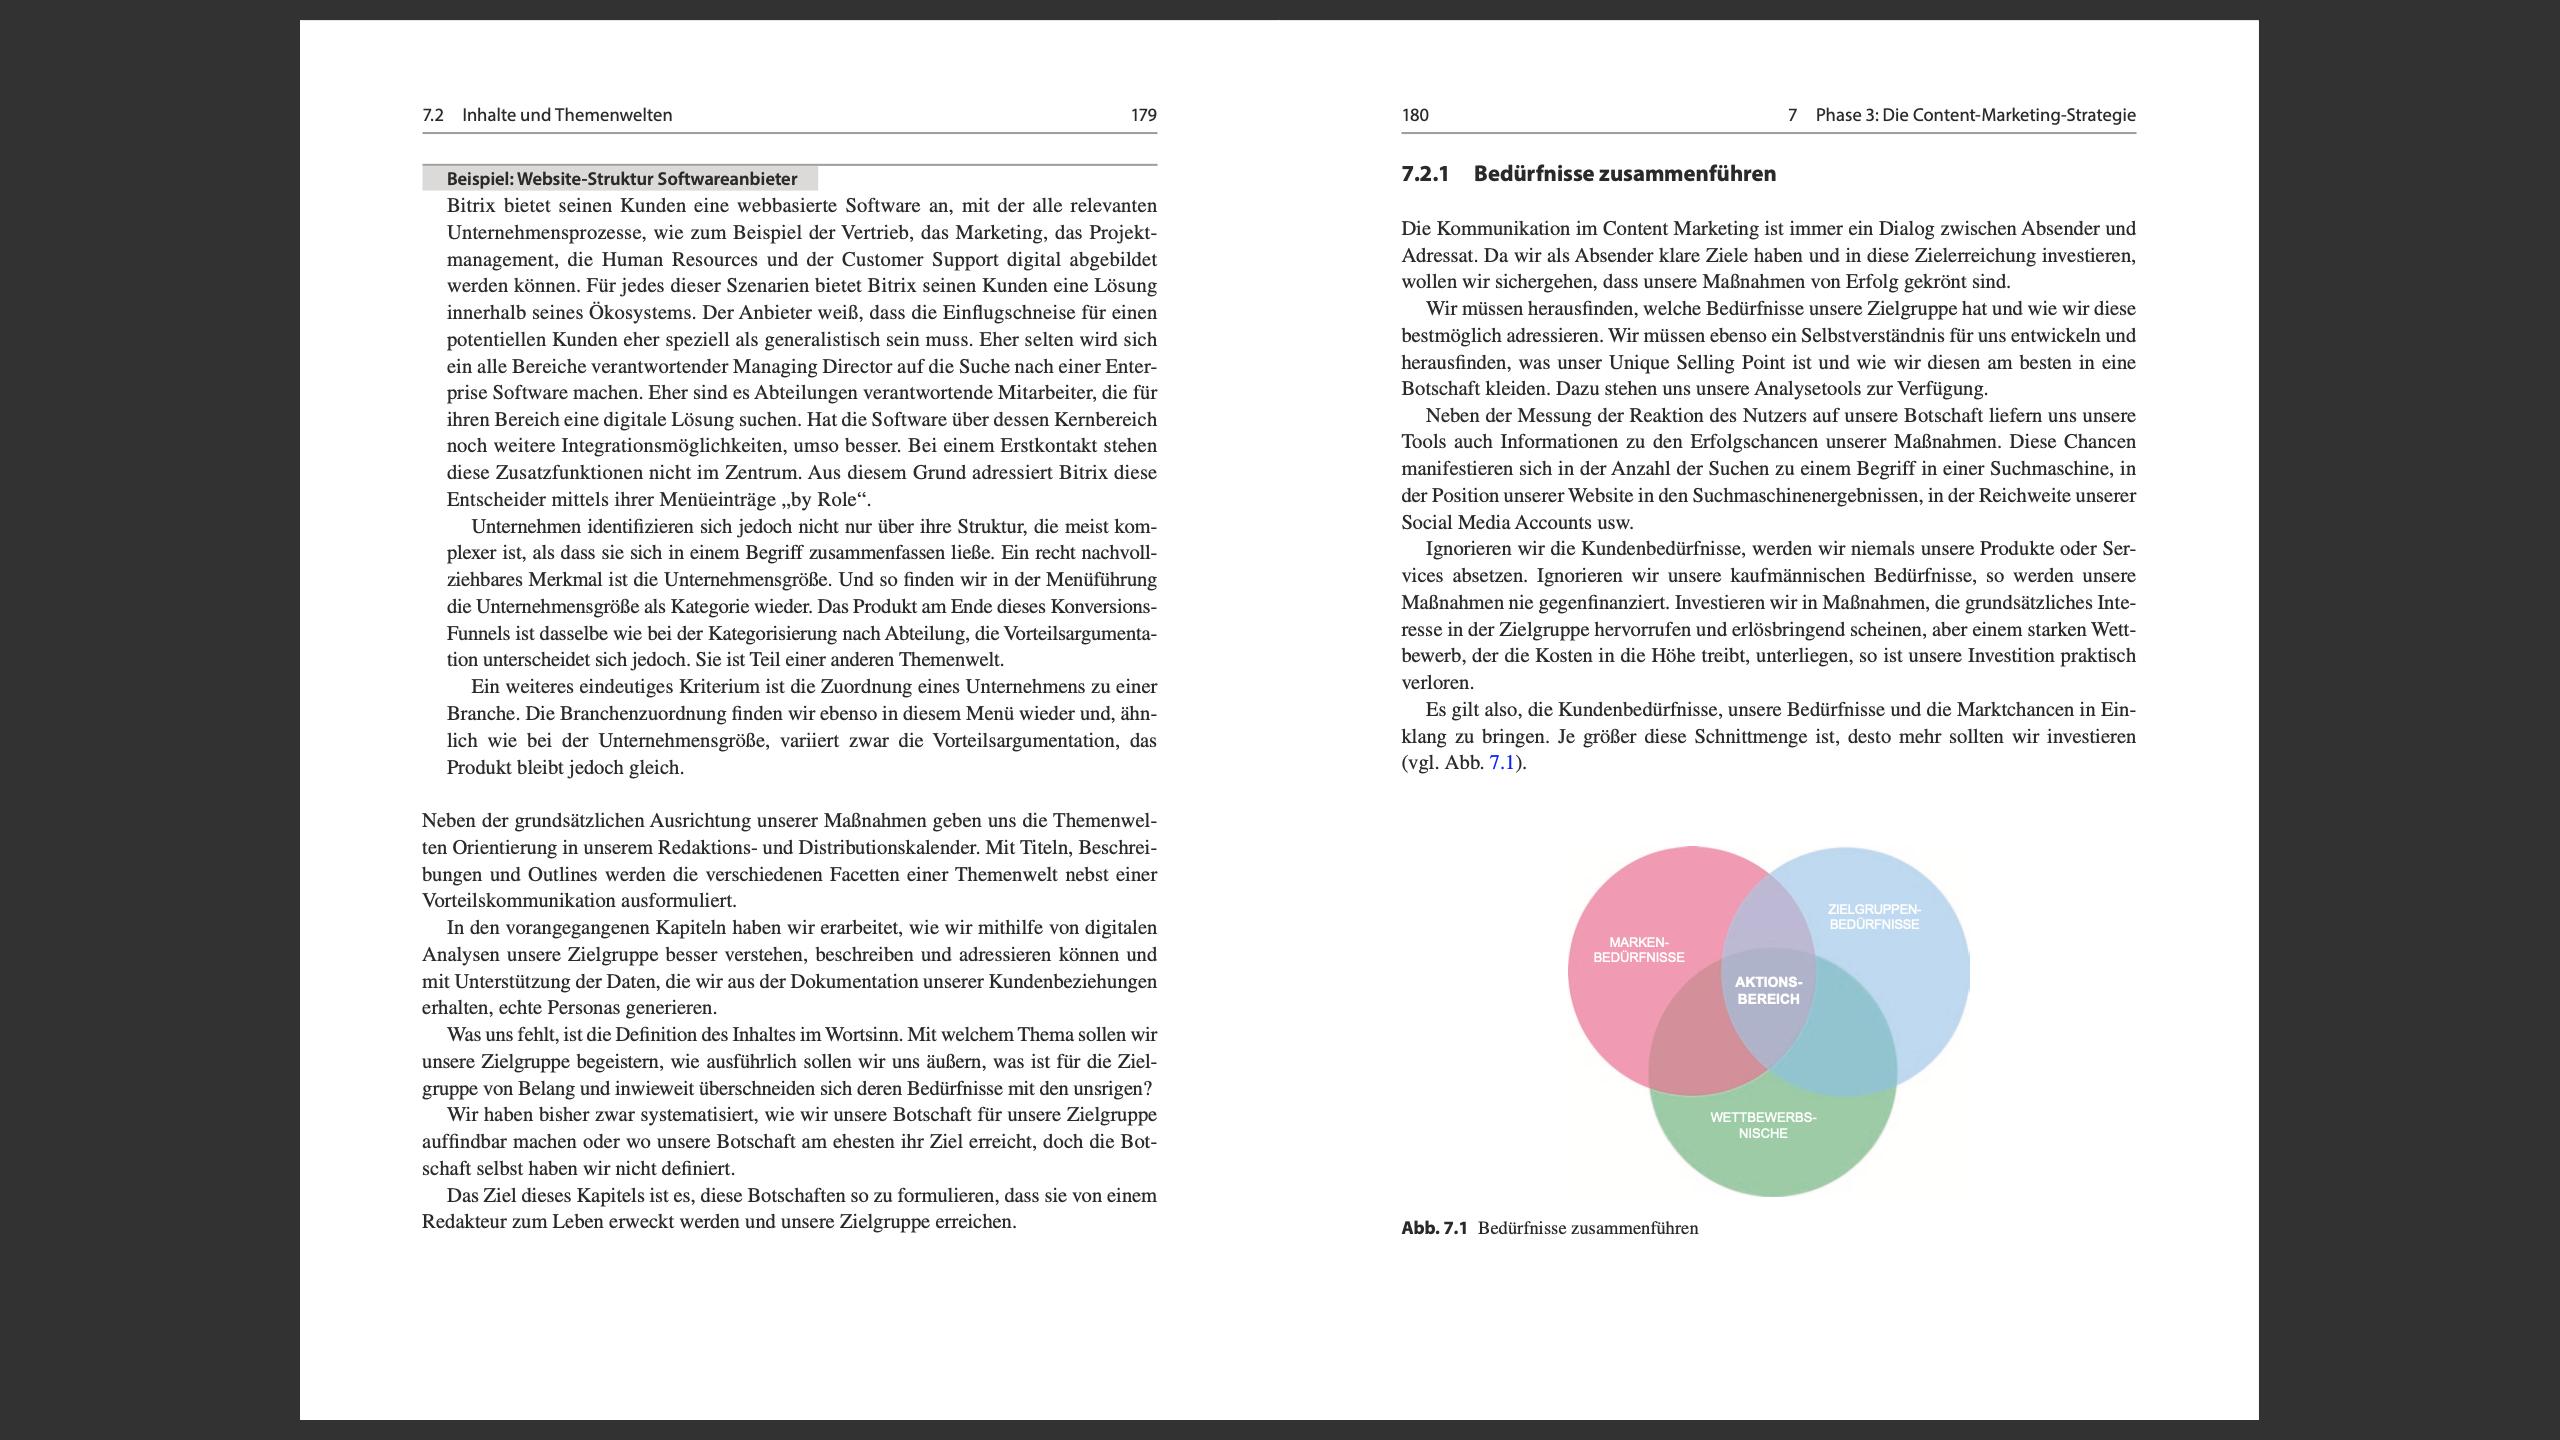 10-Methodisches-Content-Marketing-Gerrit-Grunert